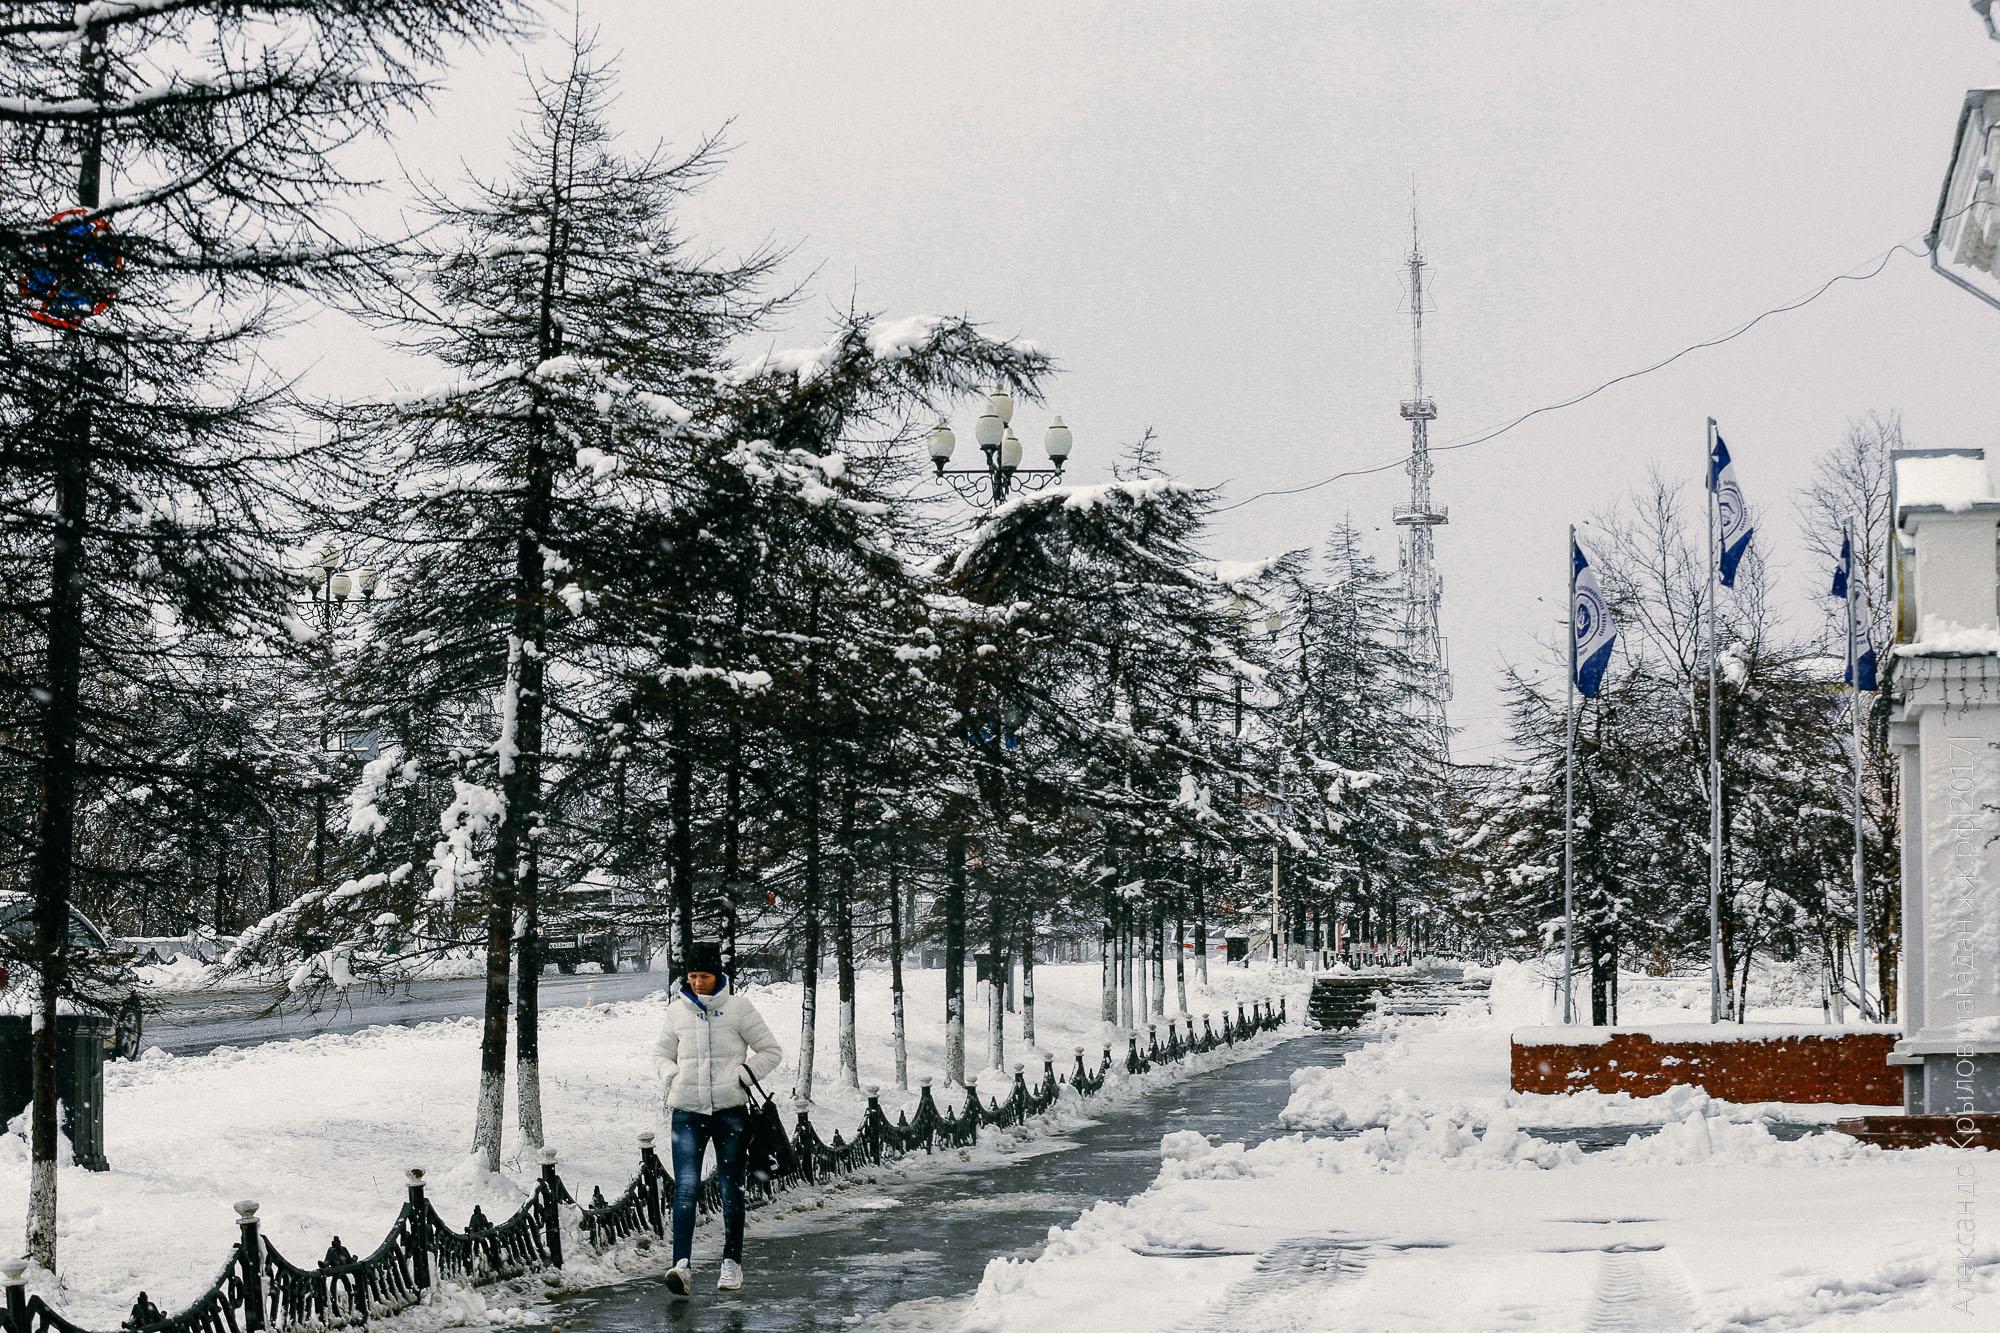 Снегопад в Магадане 19 мая. Александр Крылов